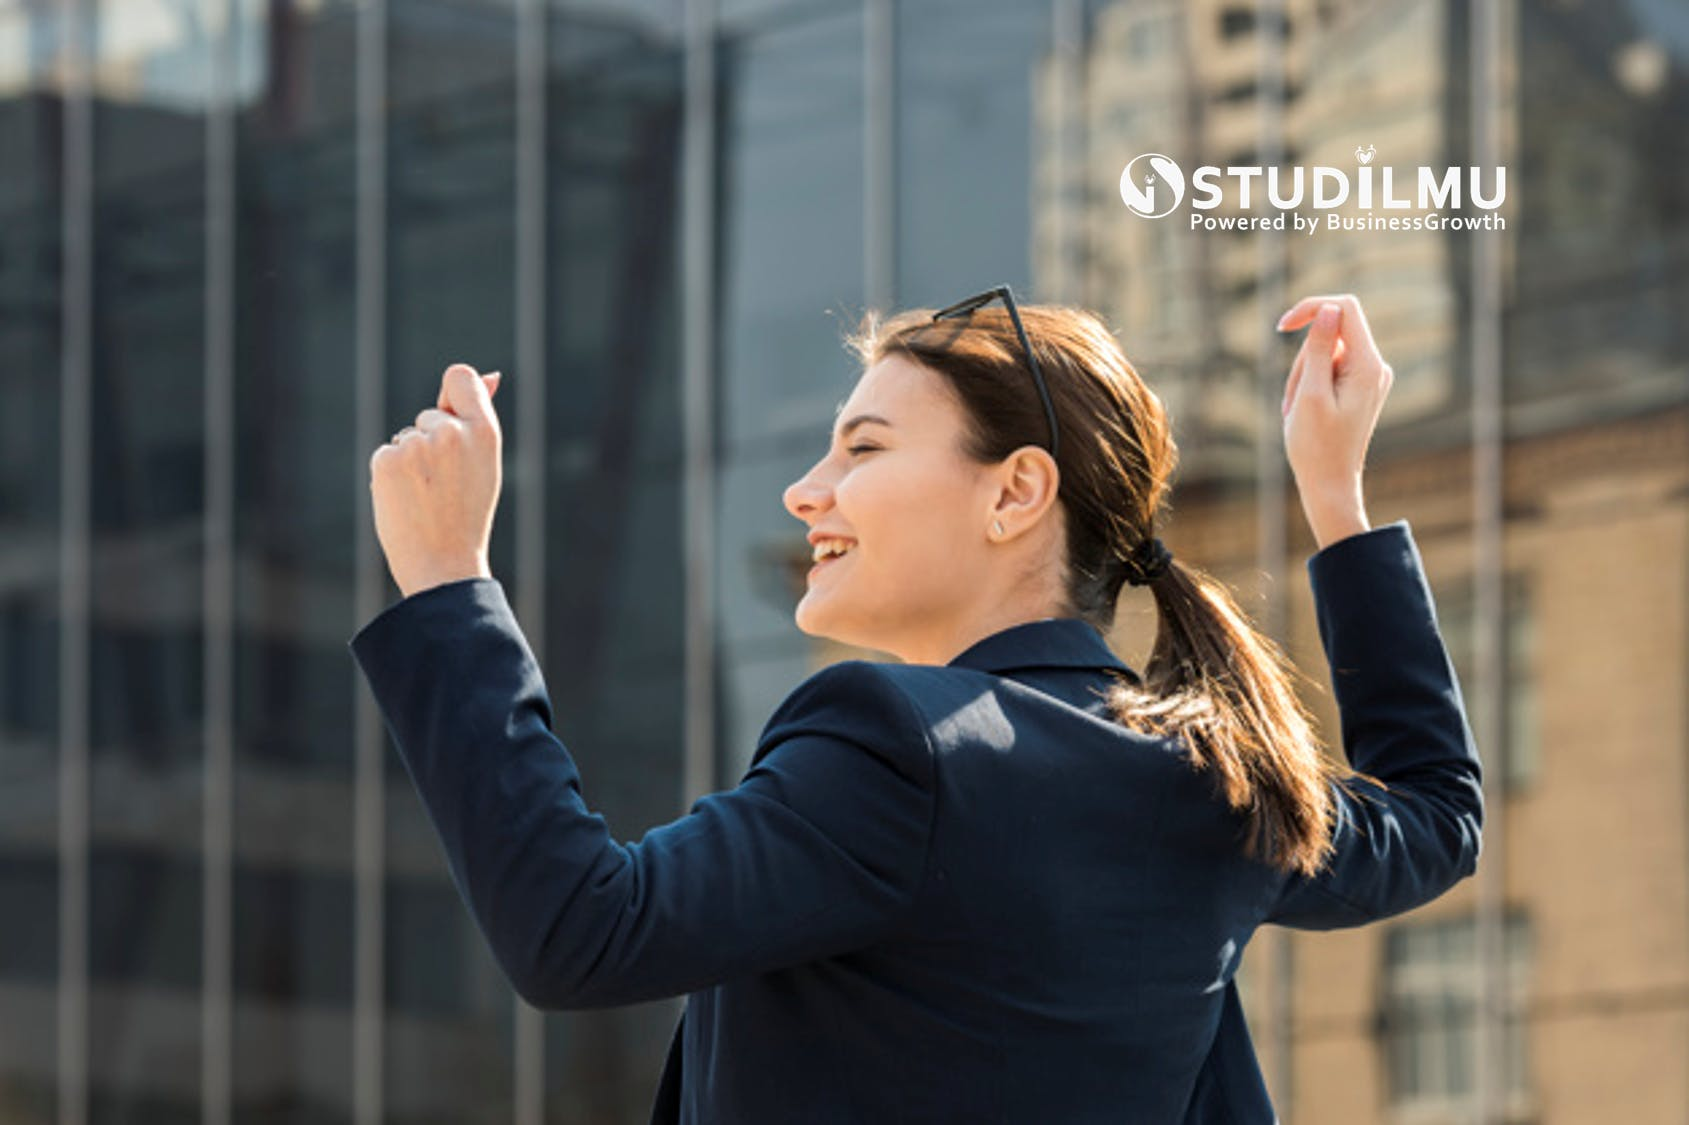 STUDILMU Career Advice - 10 Hal yang Tidak Dapat Ditoleransi oleh Pengusaha Sukses